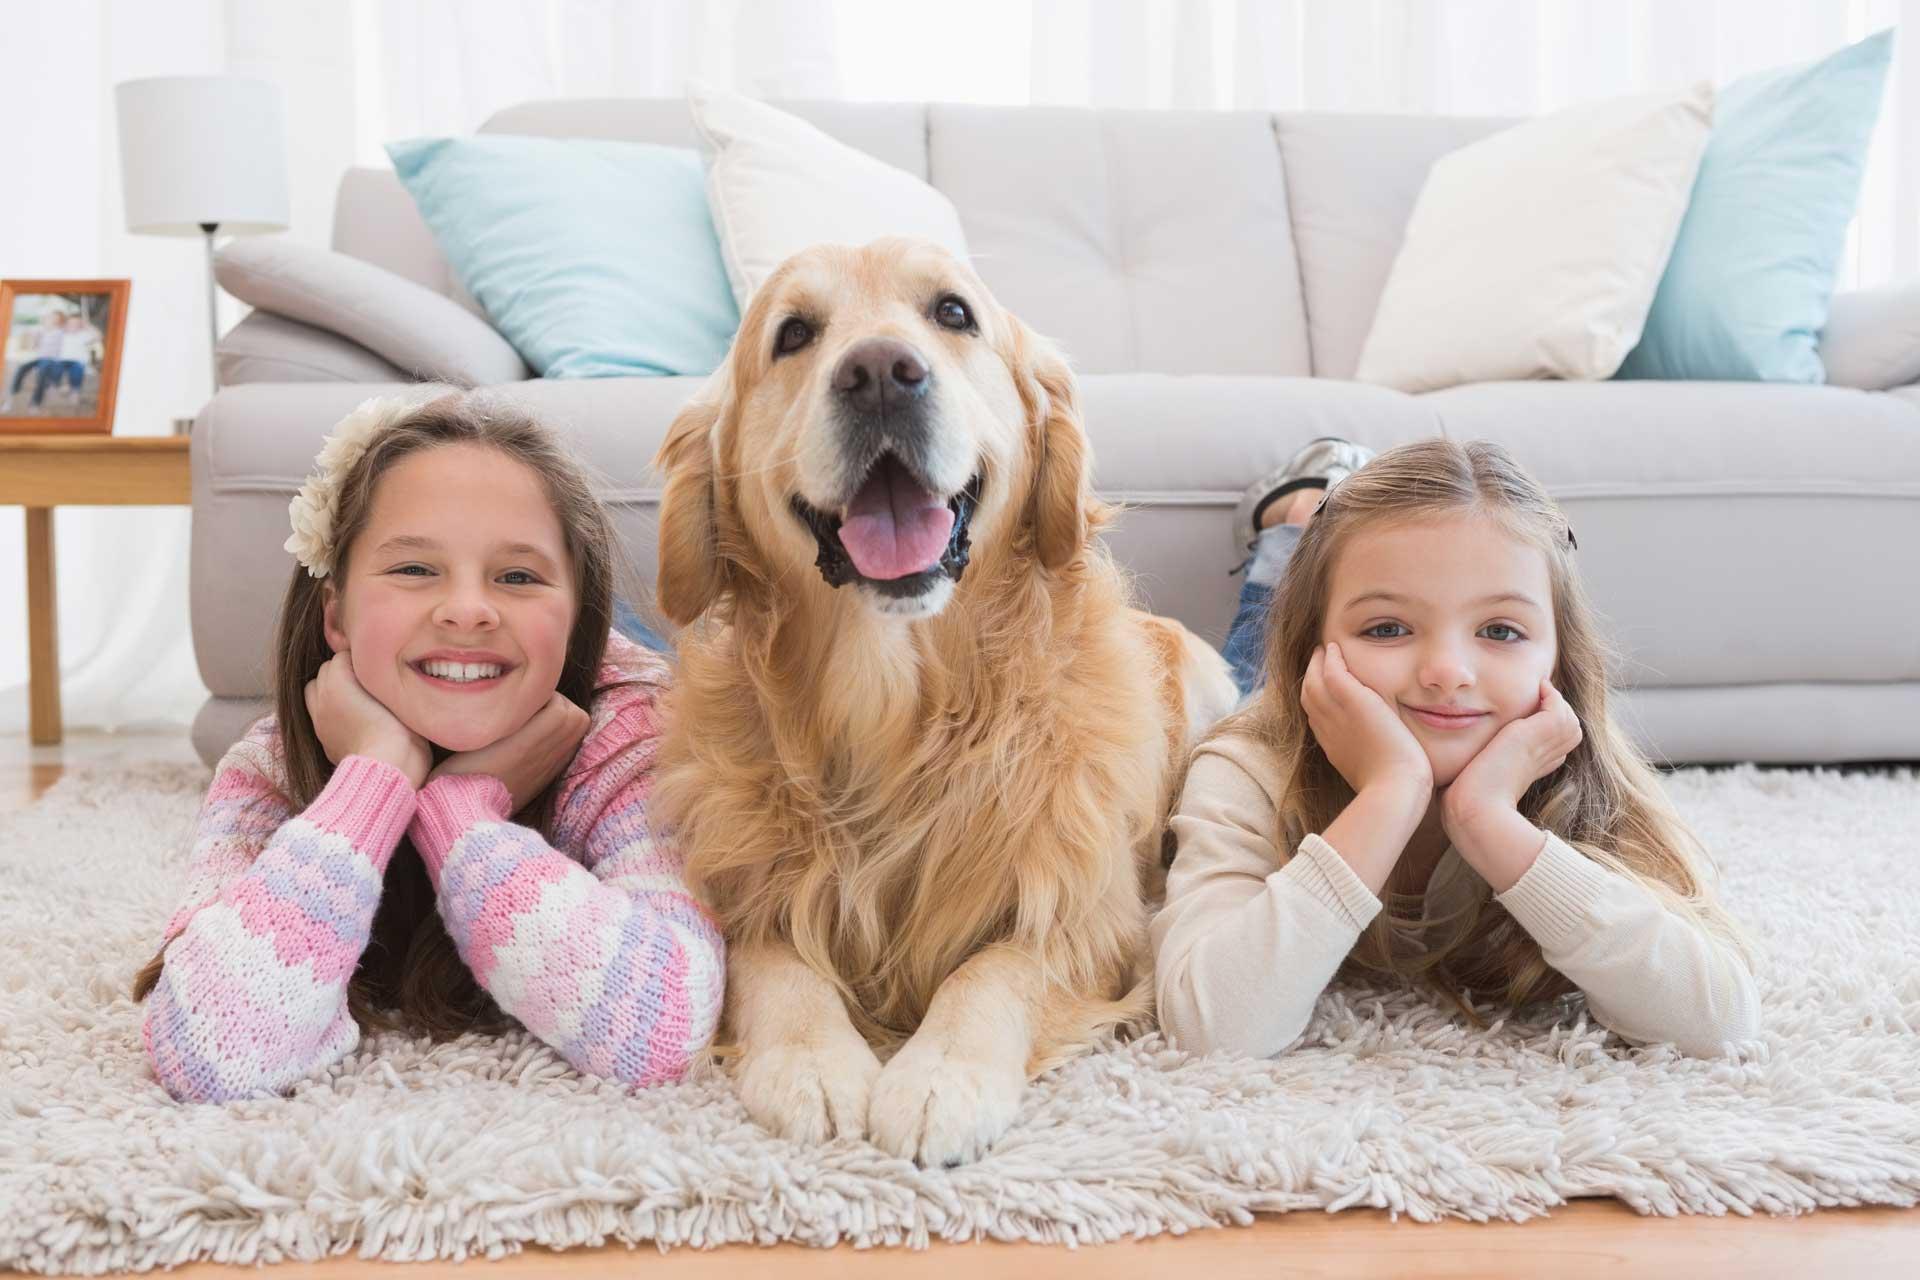 Leesburg Rug Cleaner by Carpet Keepers Eco-friendly rug cleaning